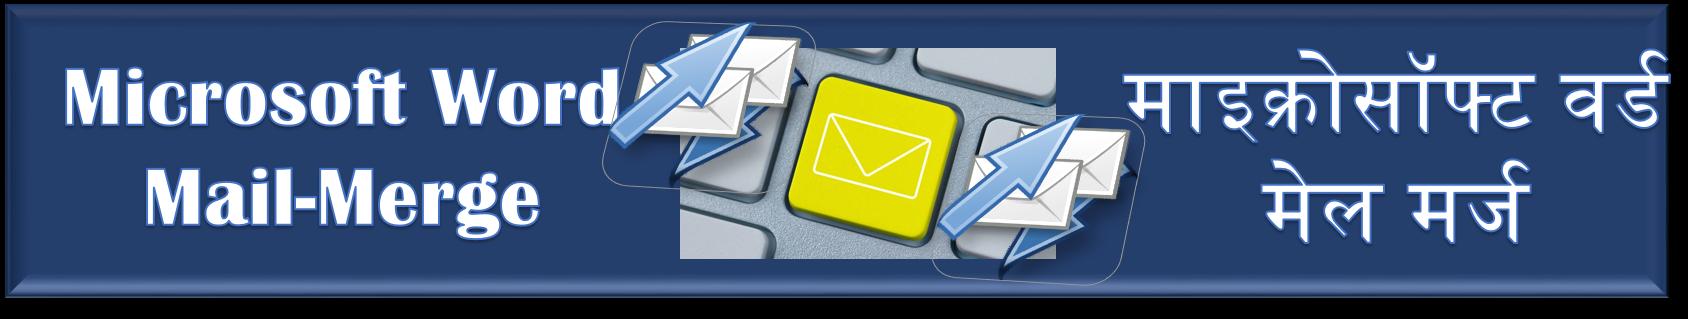 Mail Merge in MS-Word Hindi Videos